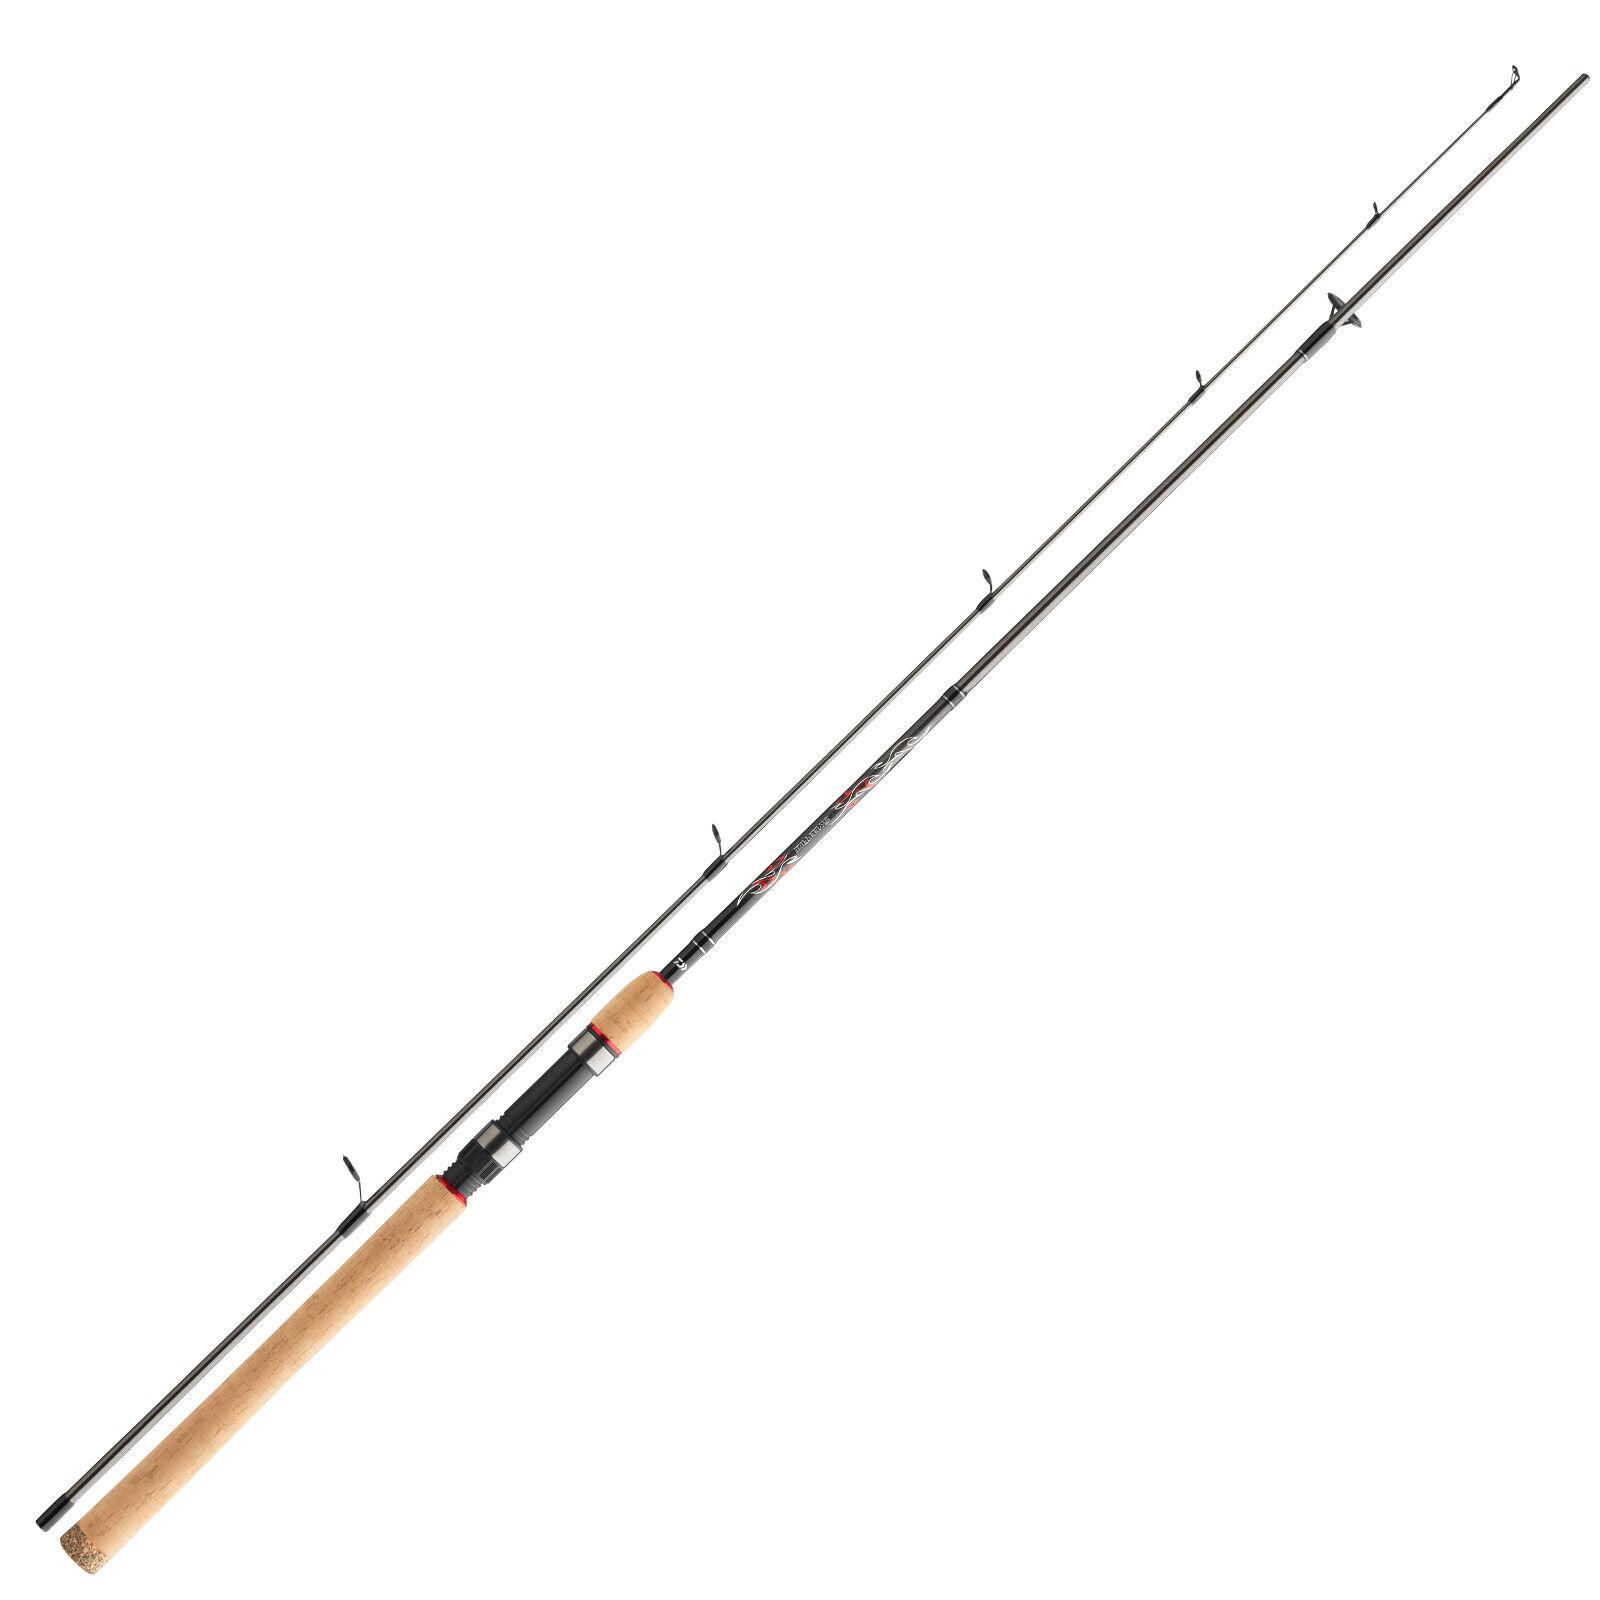 Daiwa Angelrute Spinnrute - Sweepfire Spin 2,70m 30-70g